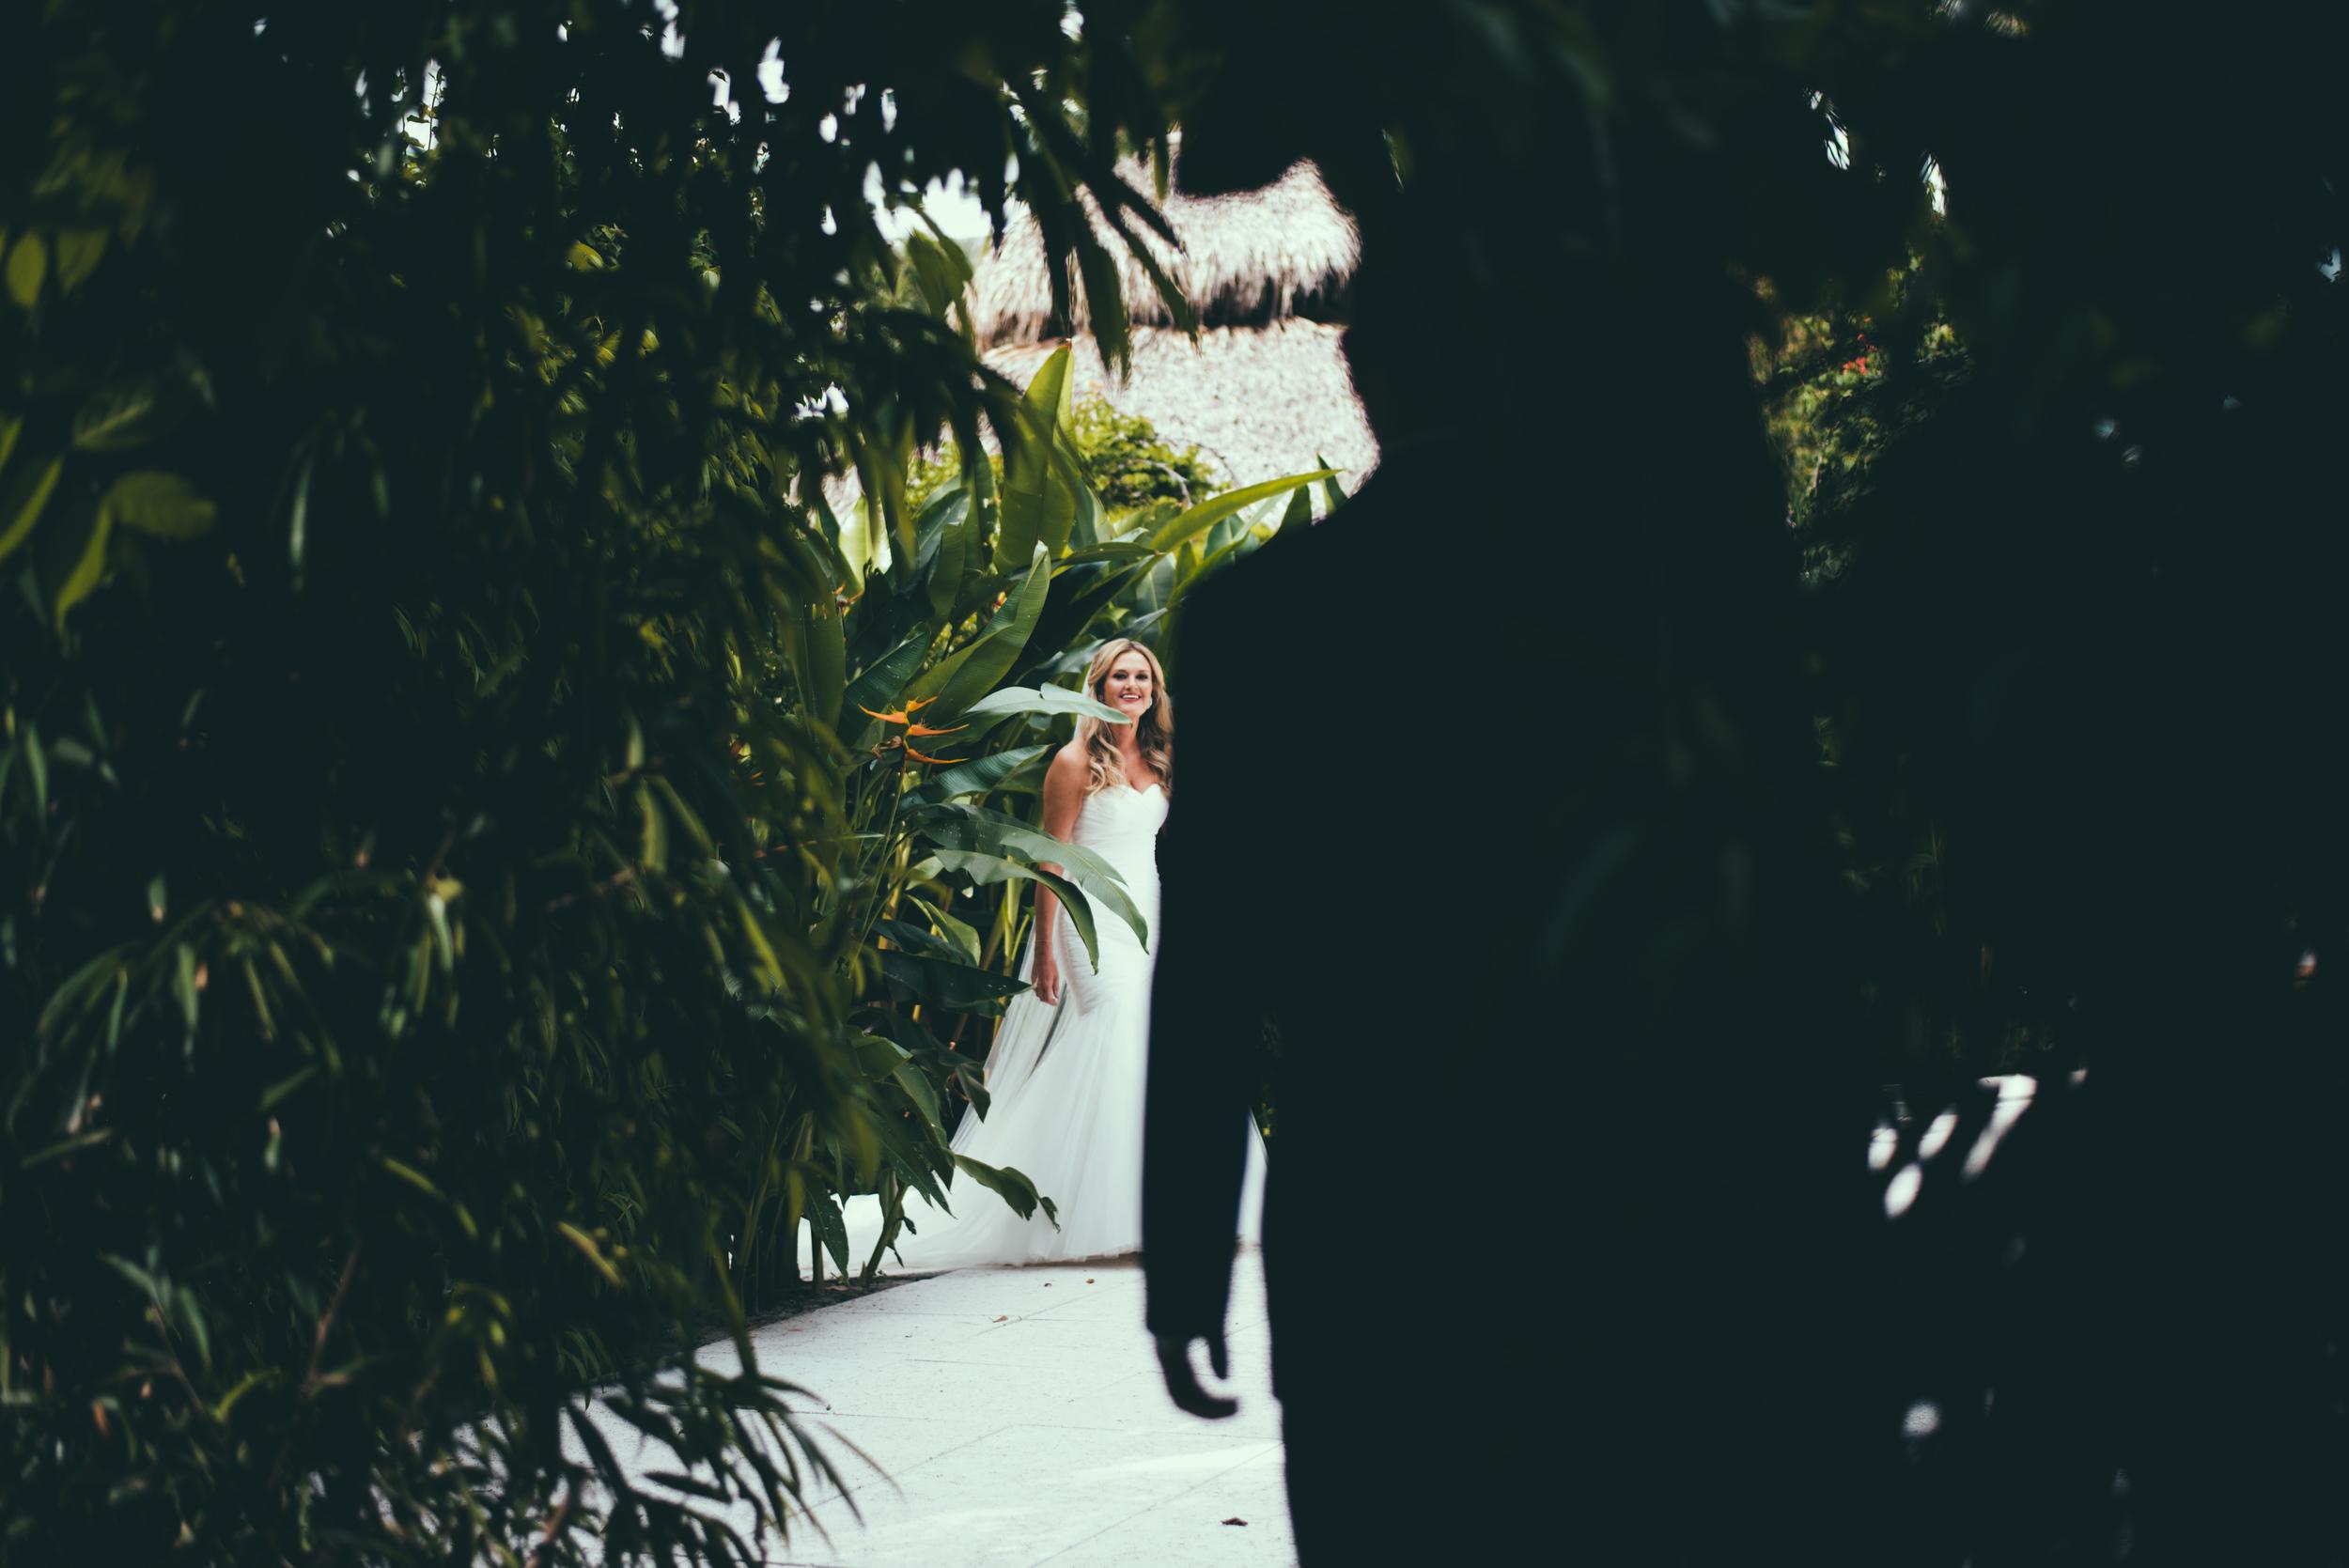 The Palms Hotel & Spa Wedding Miami Florida Photographer First Look Garden Bride Walking